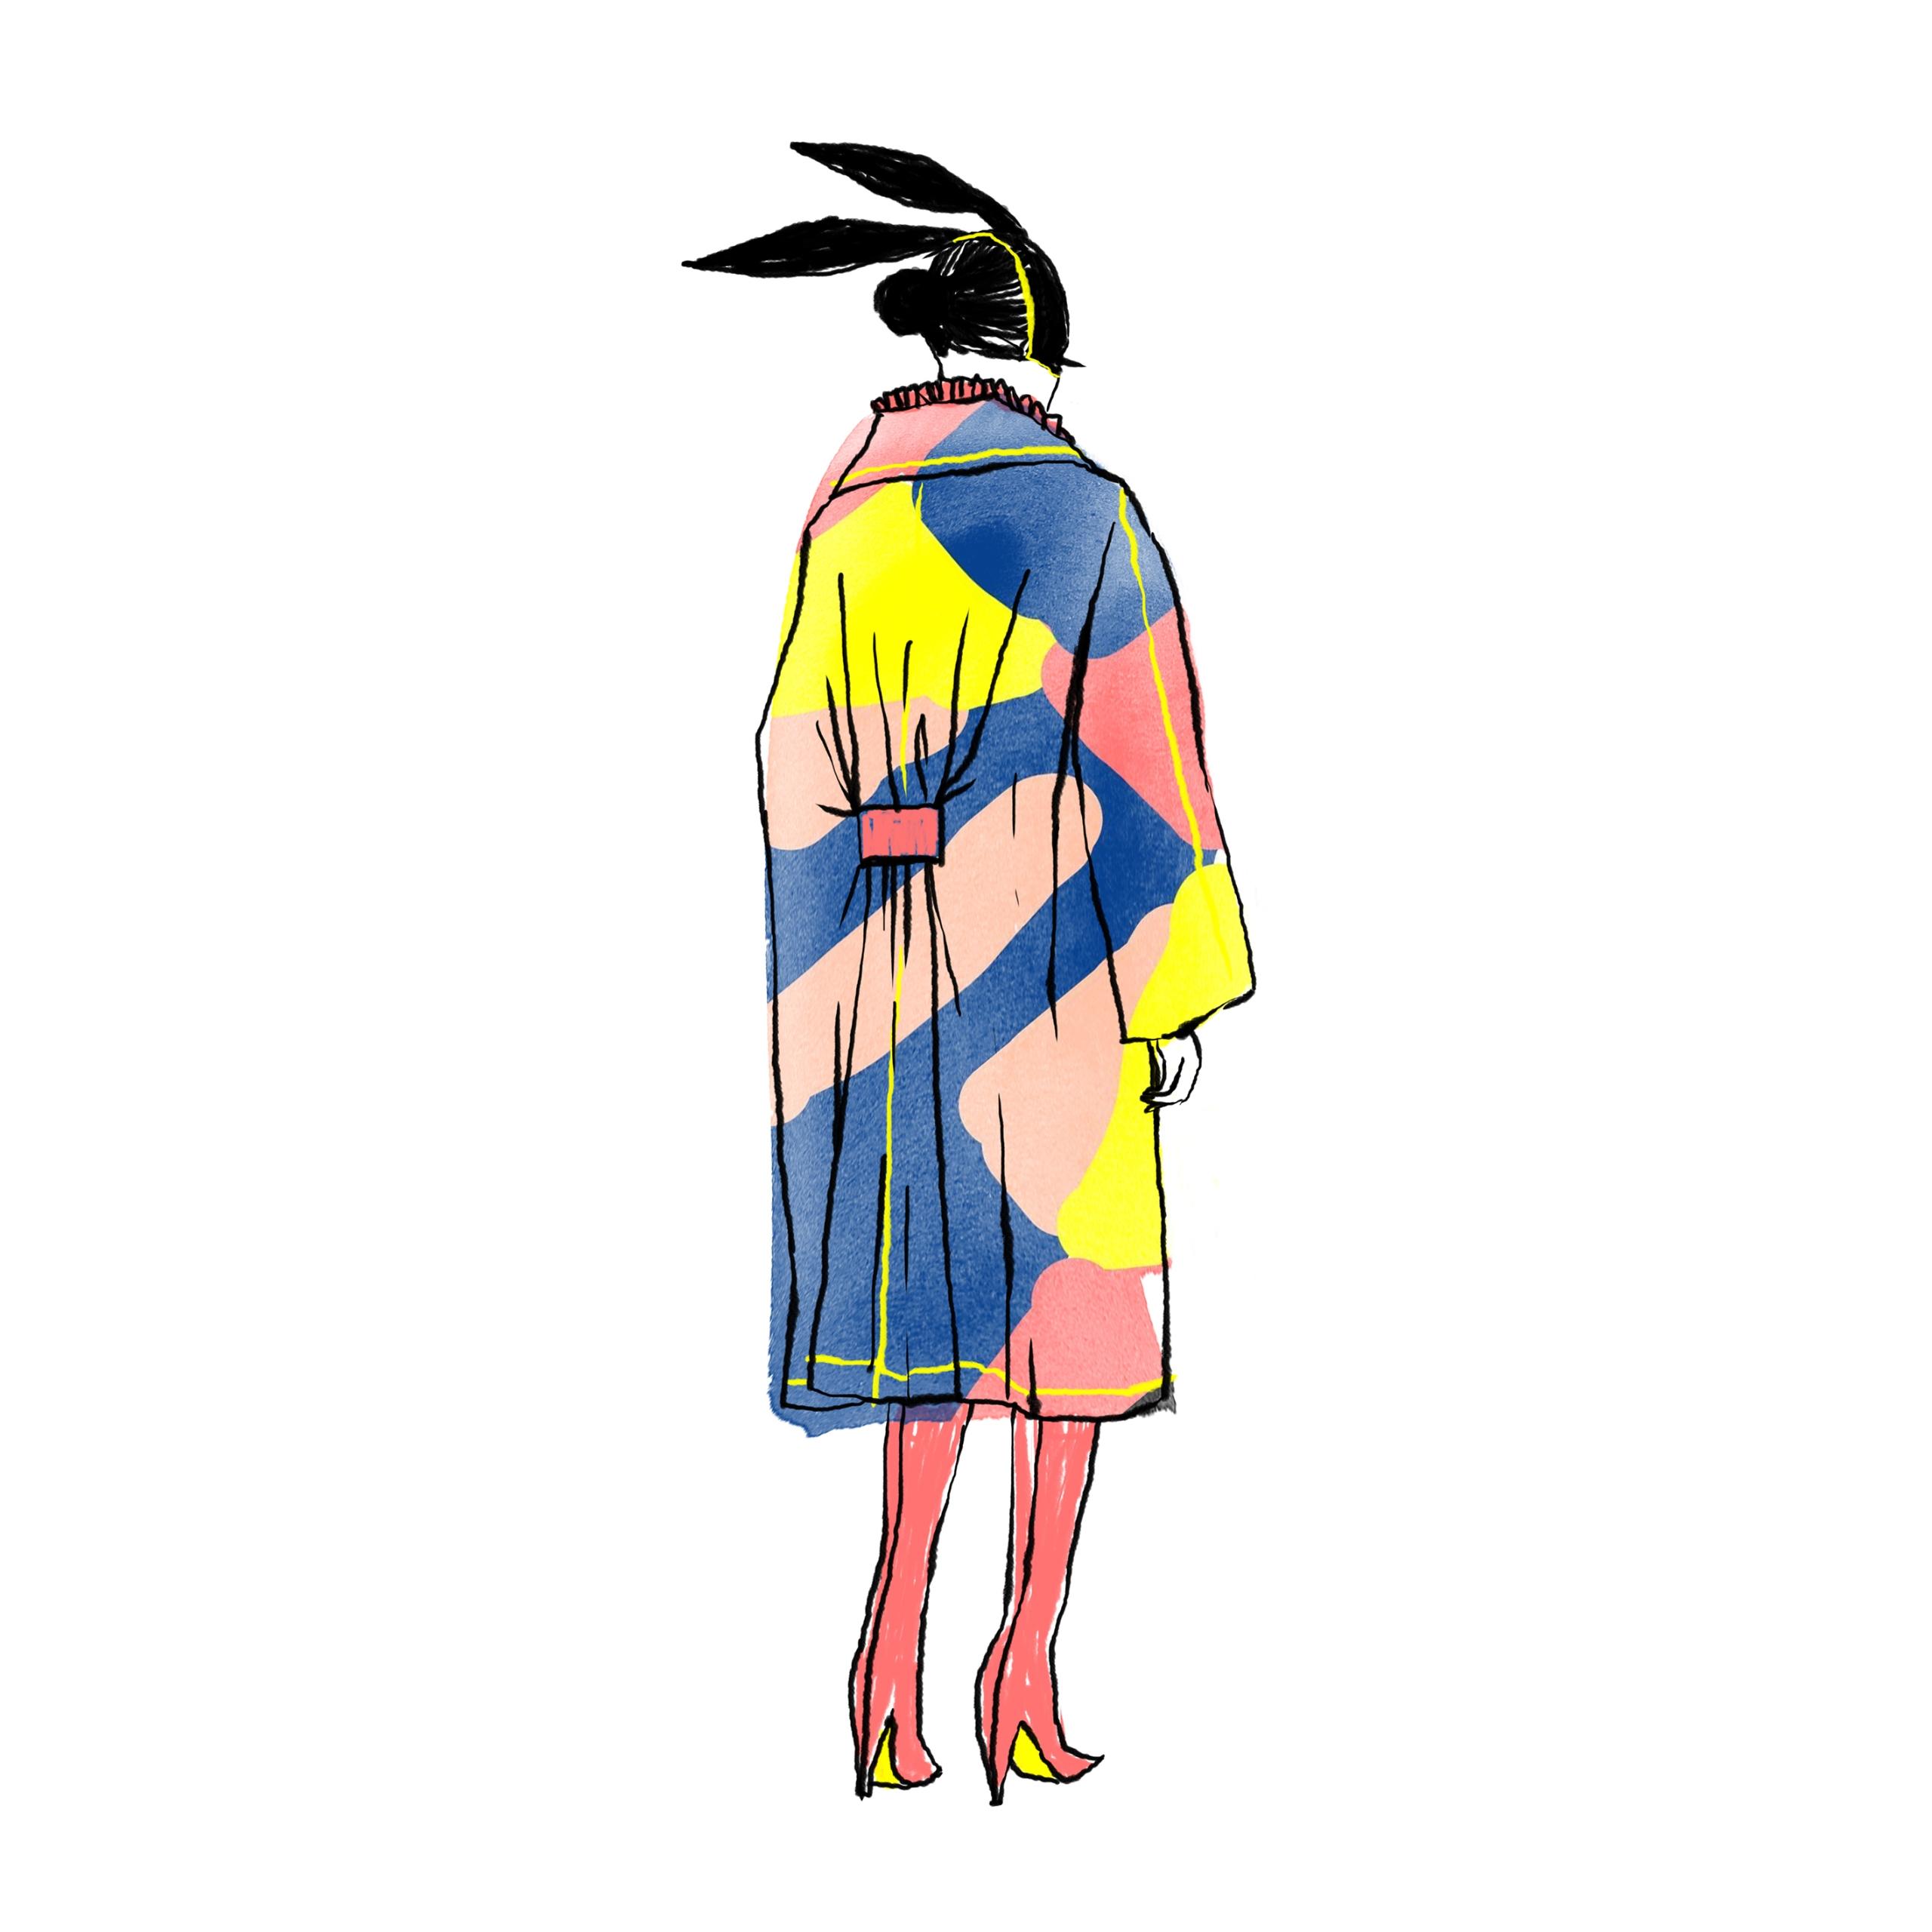 JM DU Fashion Illustration - julienmartin | ello